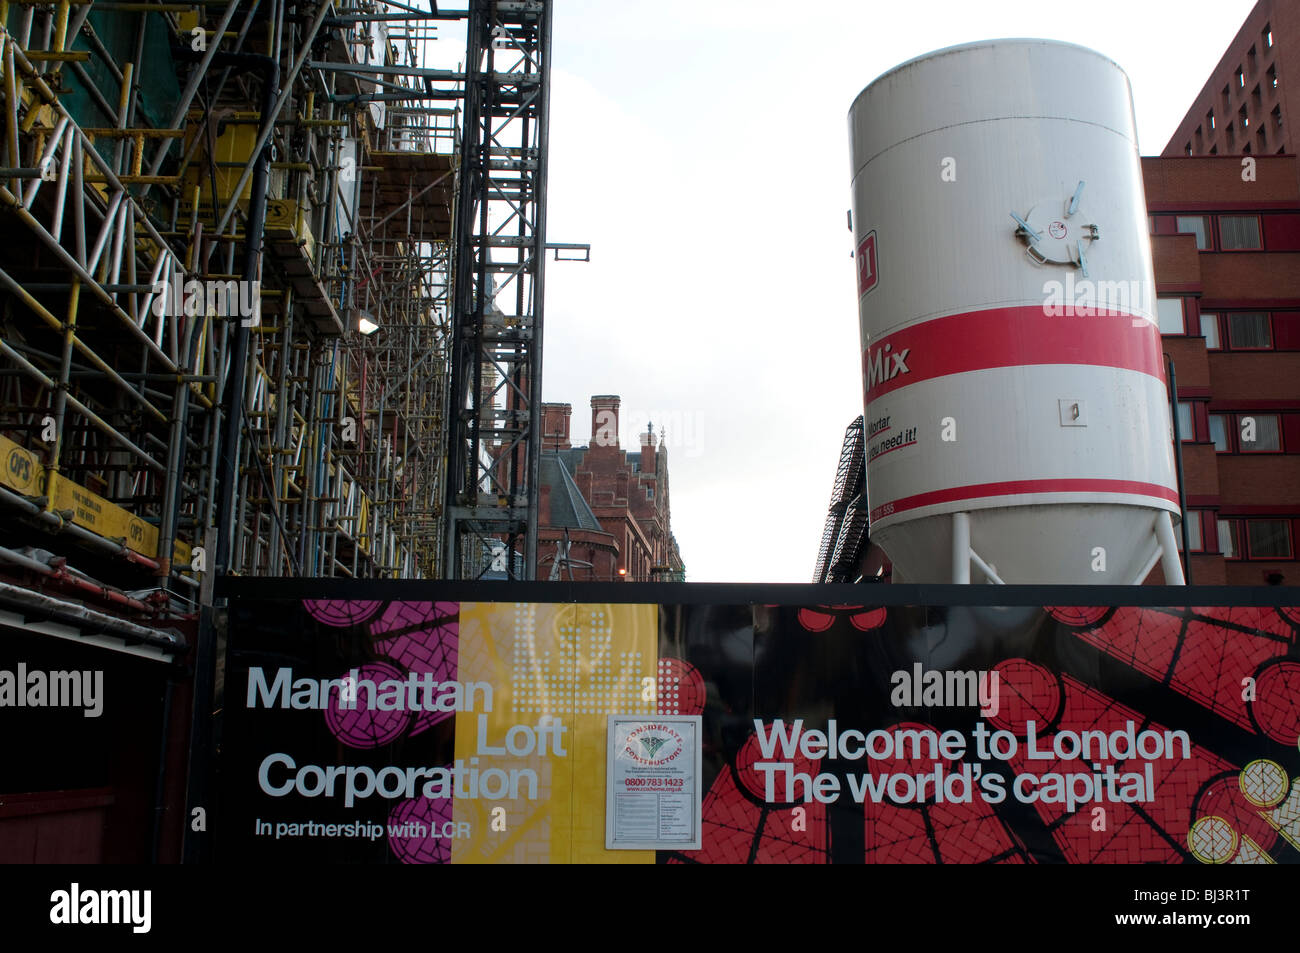 St Pancras construction site, London, UK - Stock Image